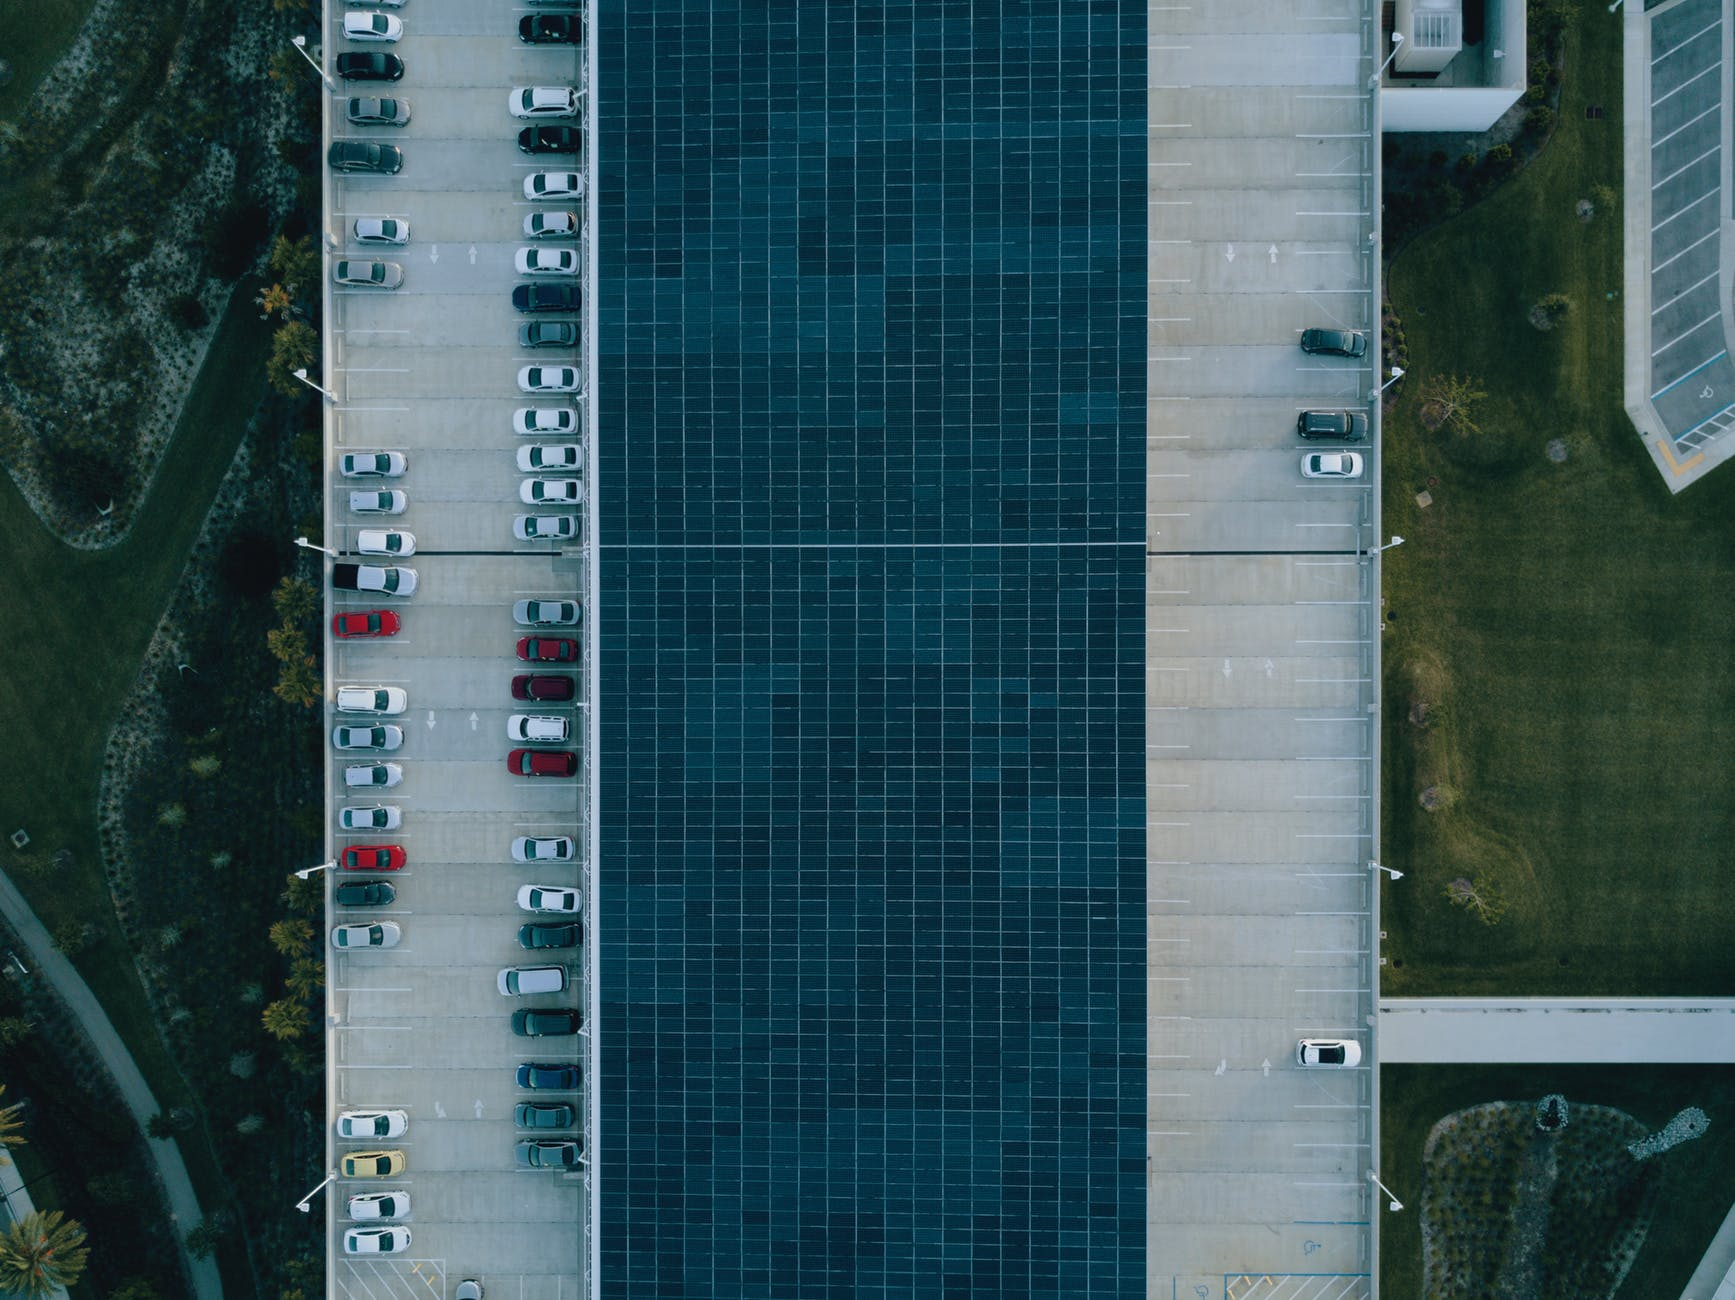 IoT Parking